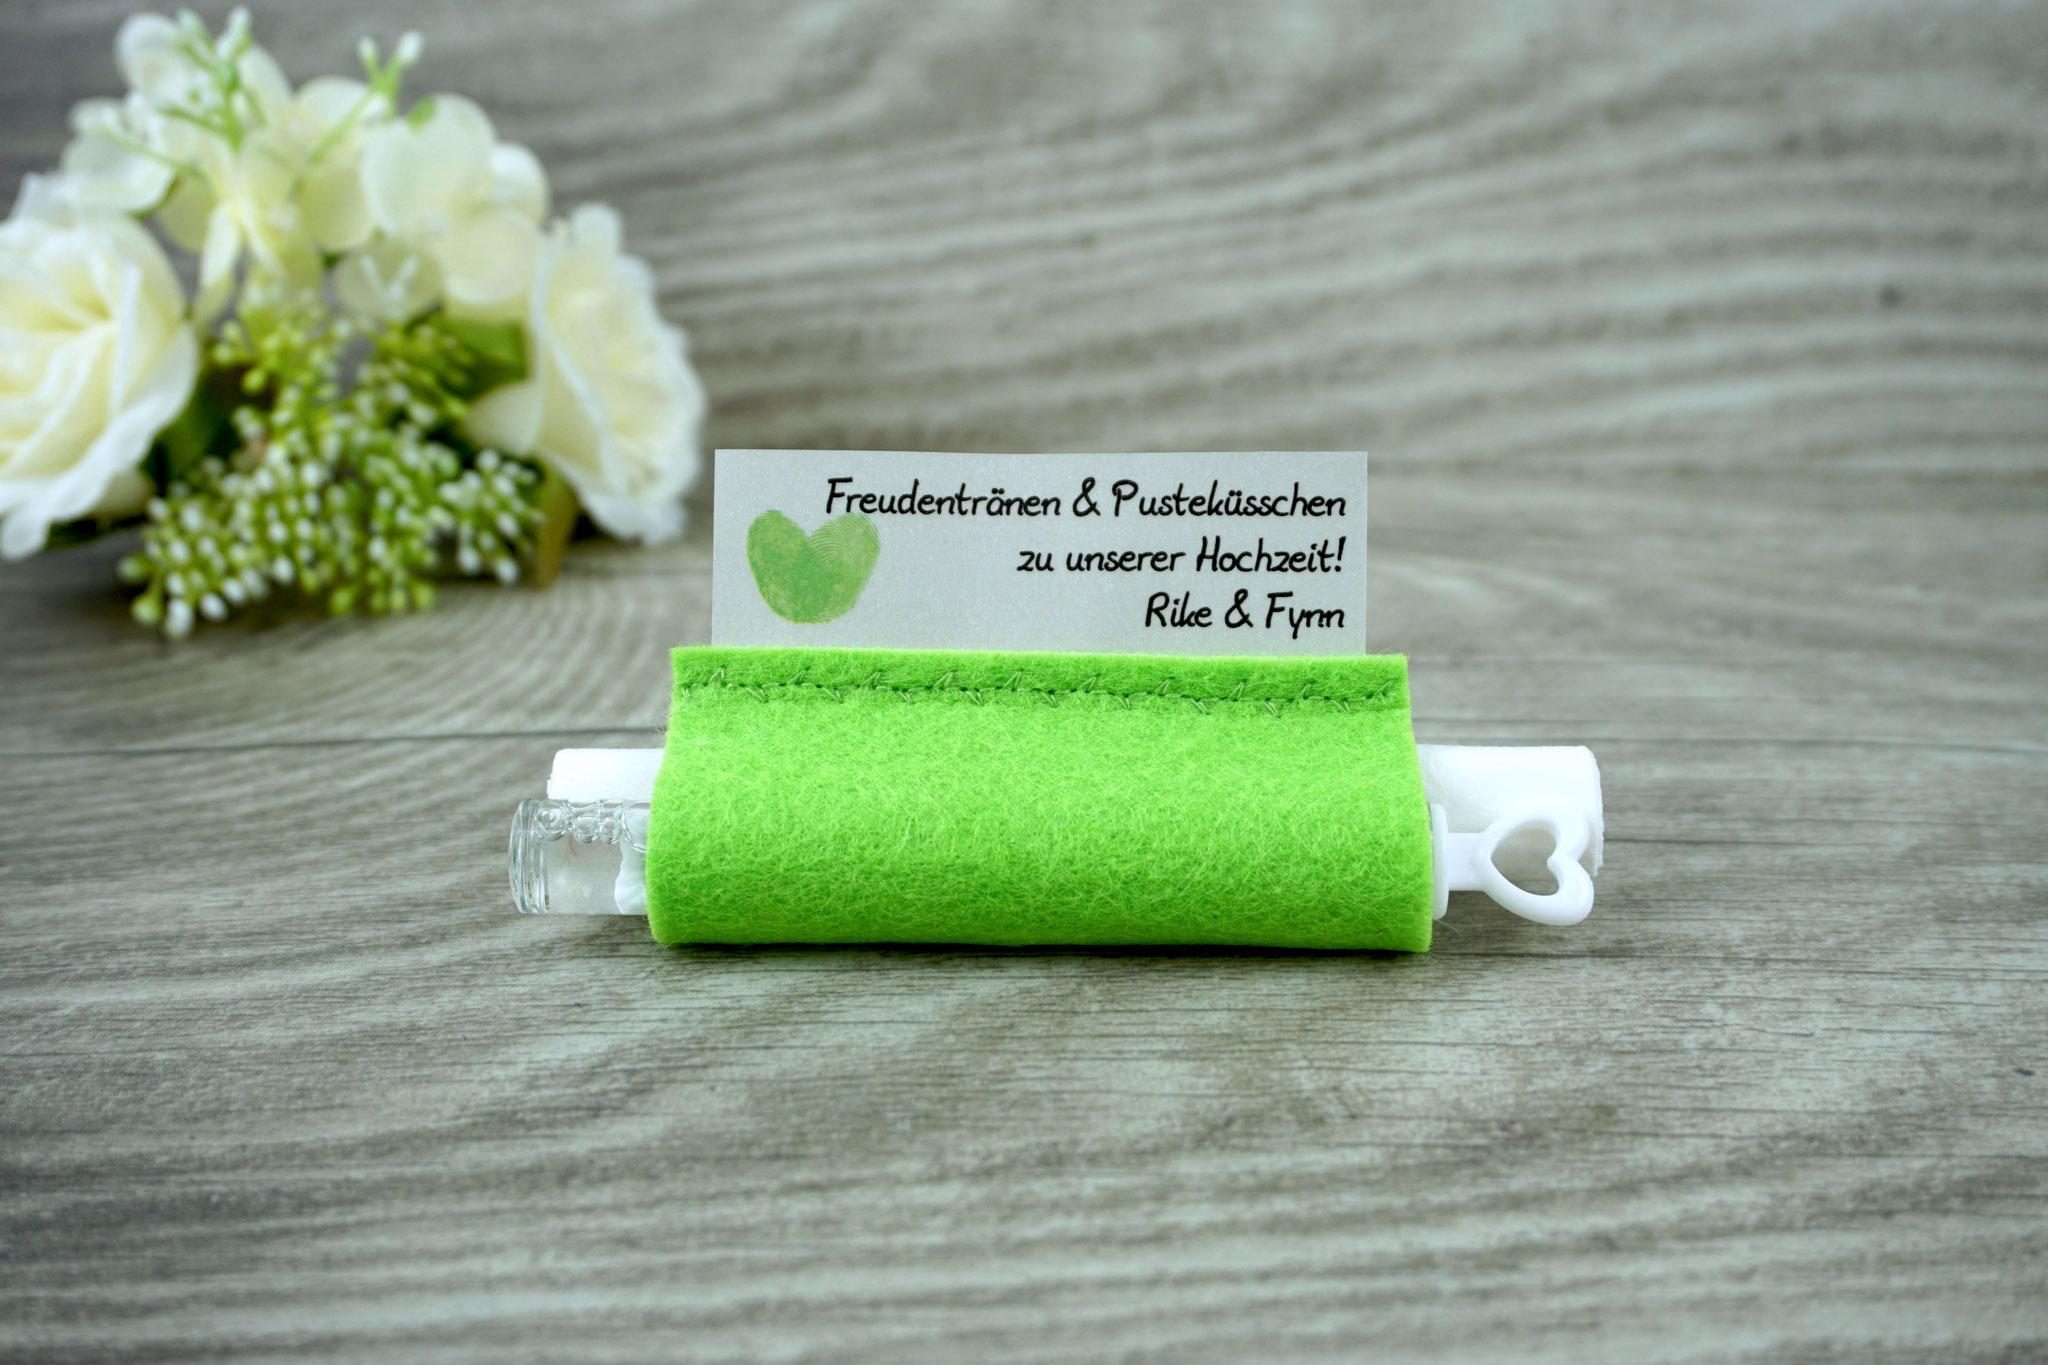 Freudentränen Taschentücher mit Weddingbubbles, Filz apfelgrün, Design Fingerprint